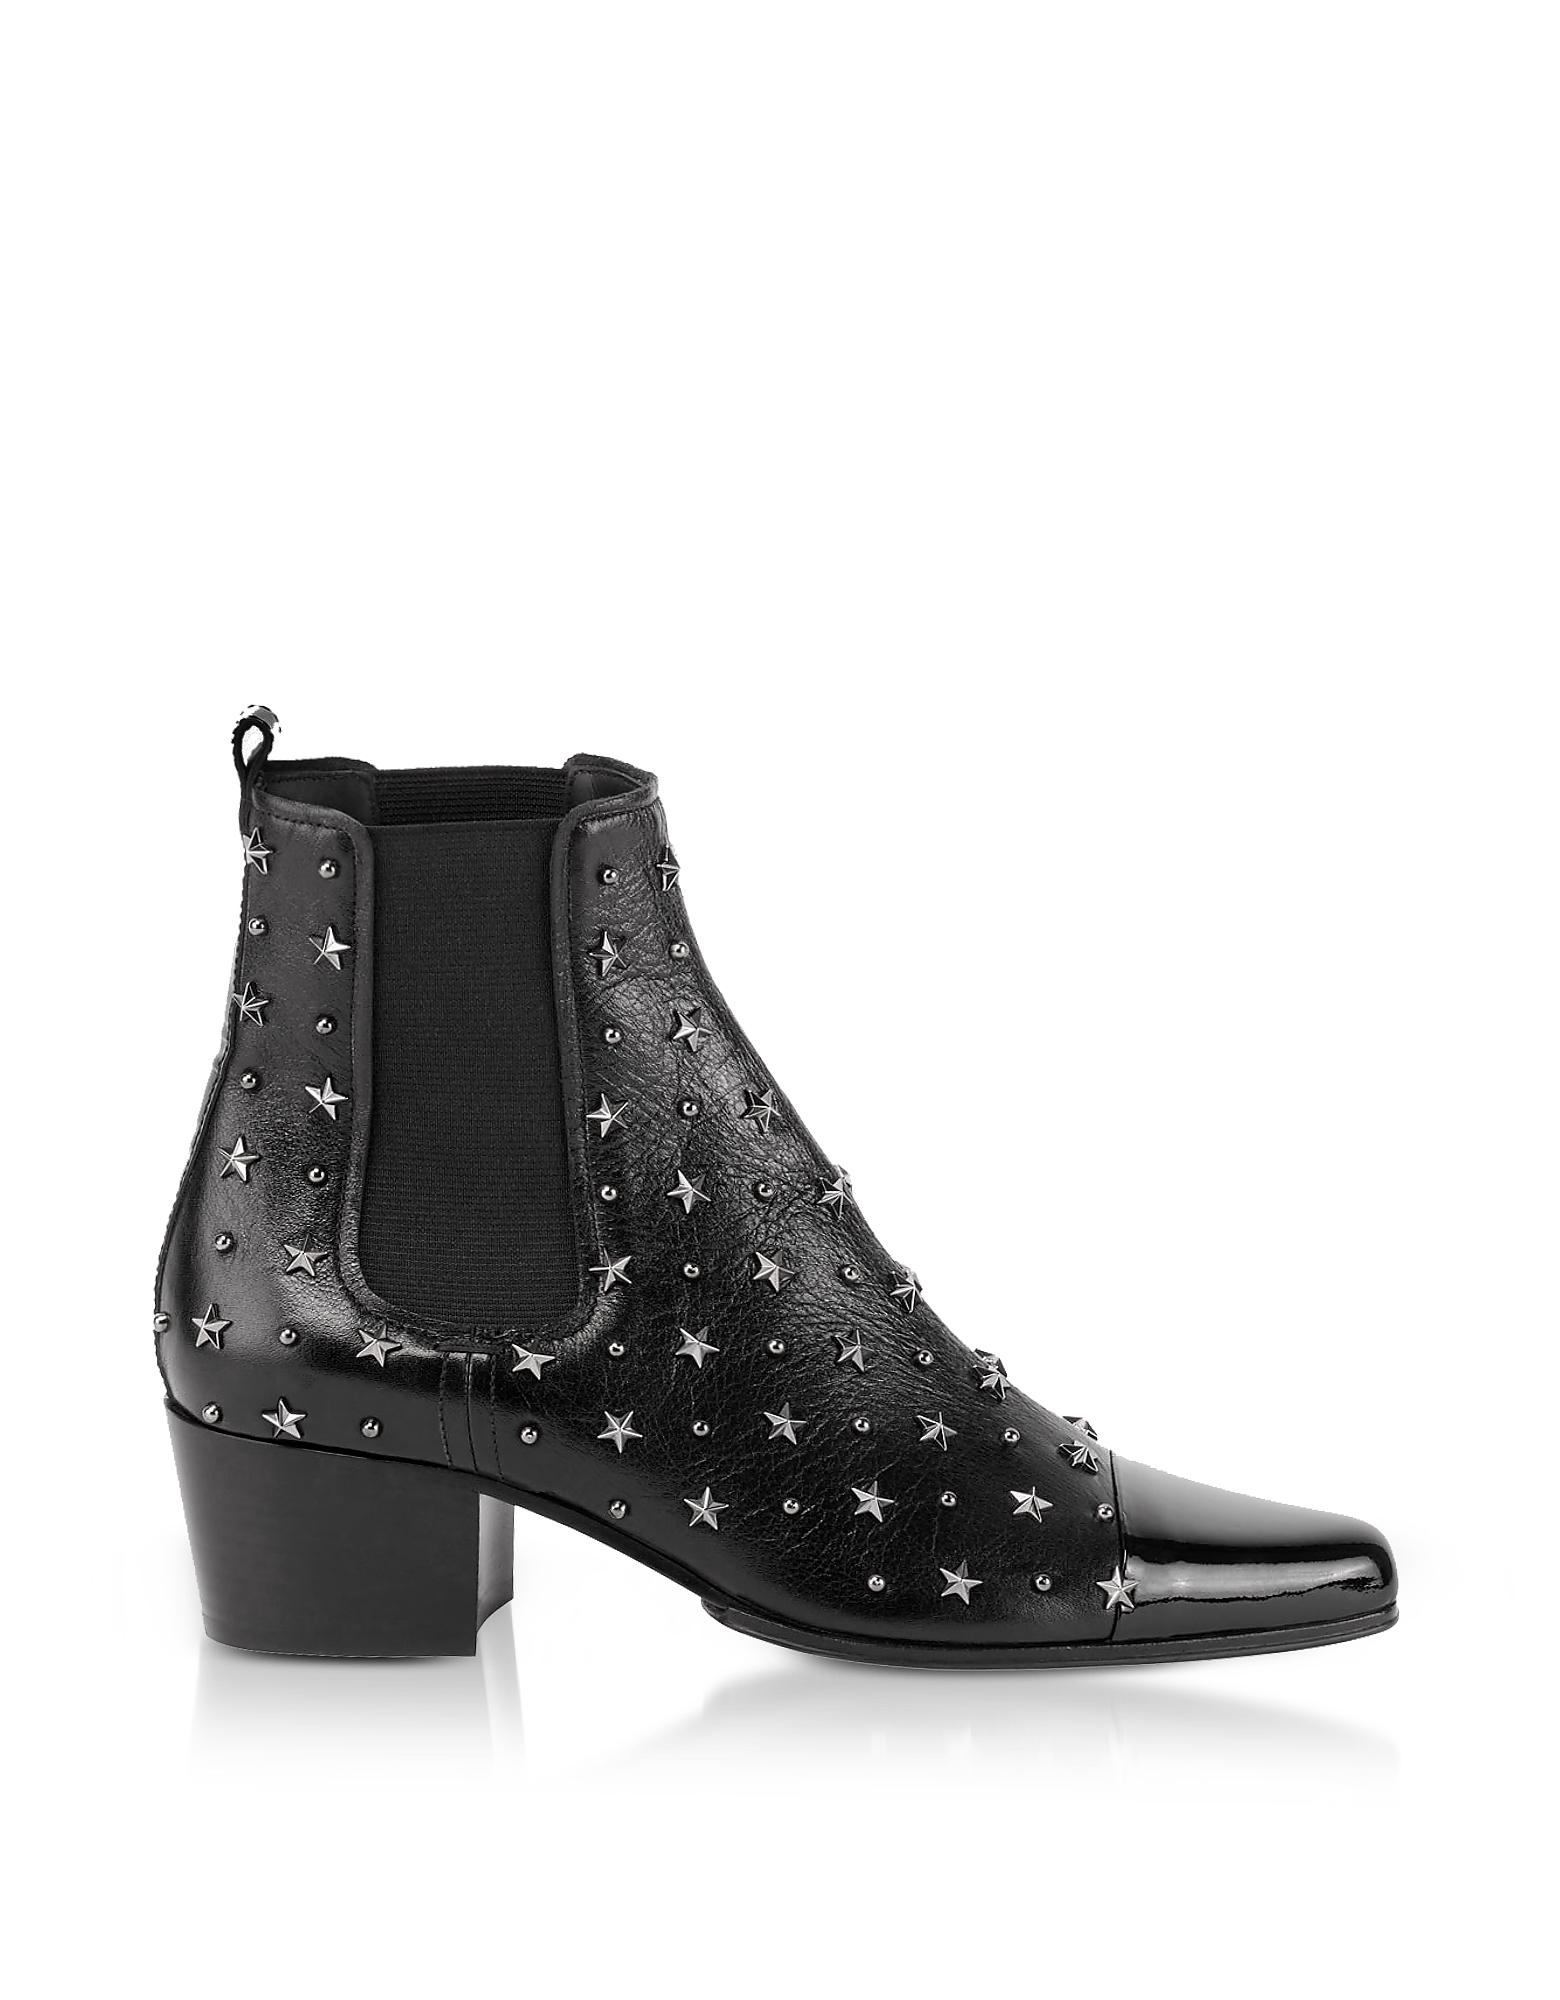 Balmain Shoes, Black Studded Patent Leather Arthemisia Etoiles Boots